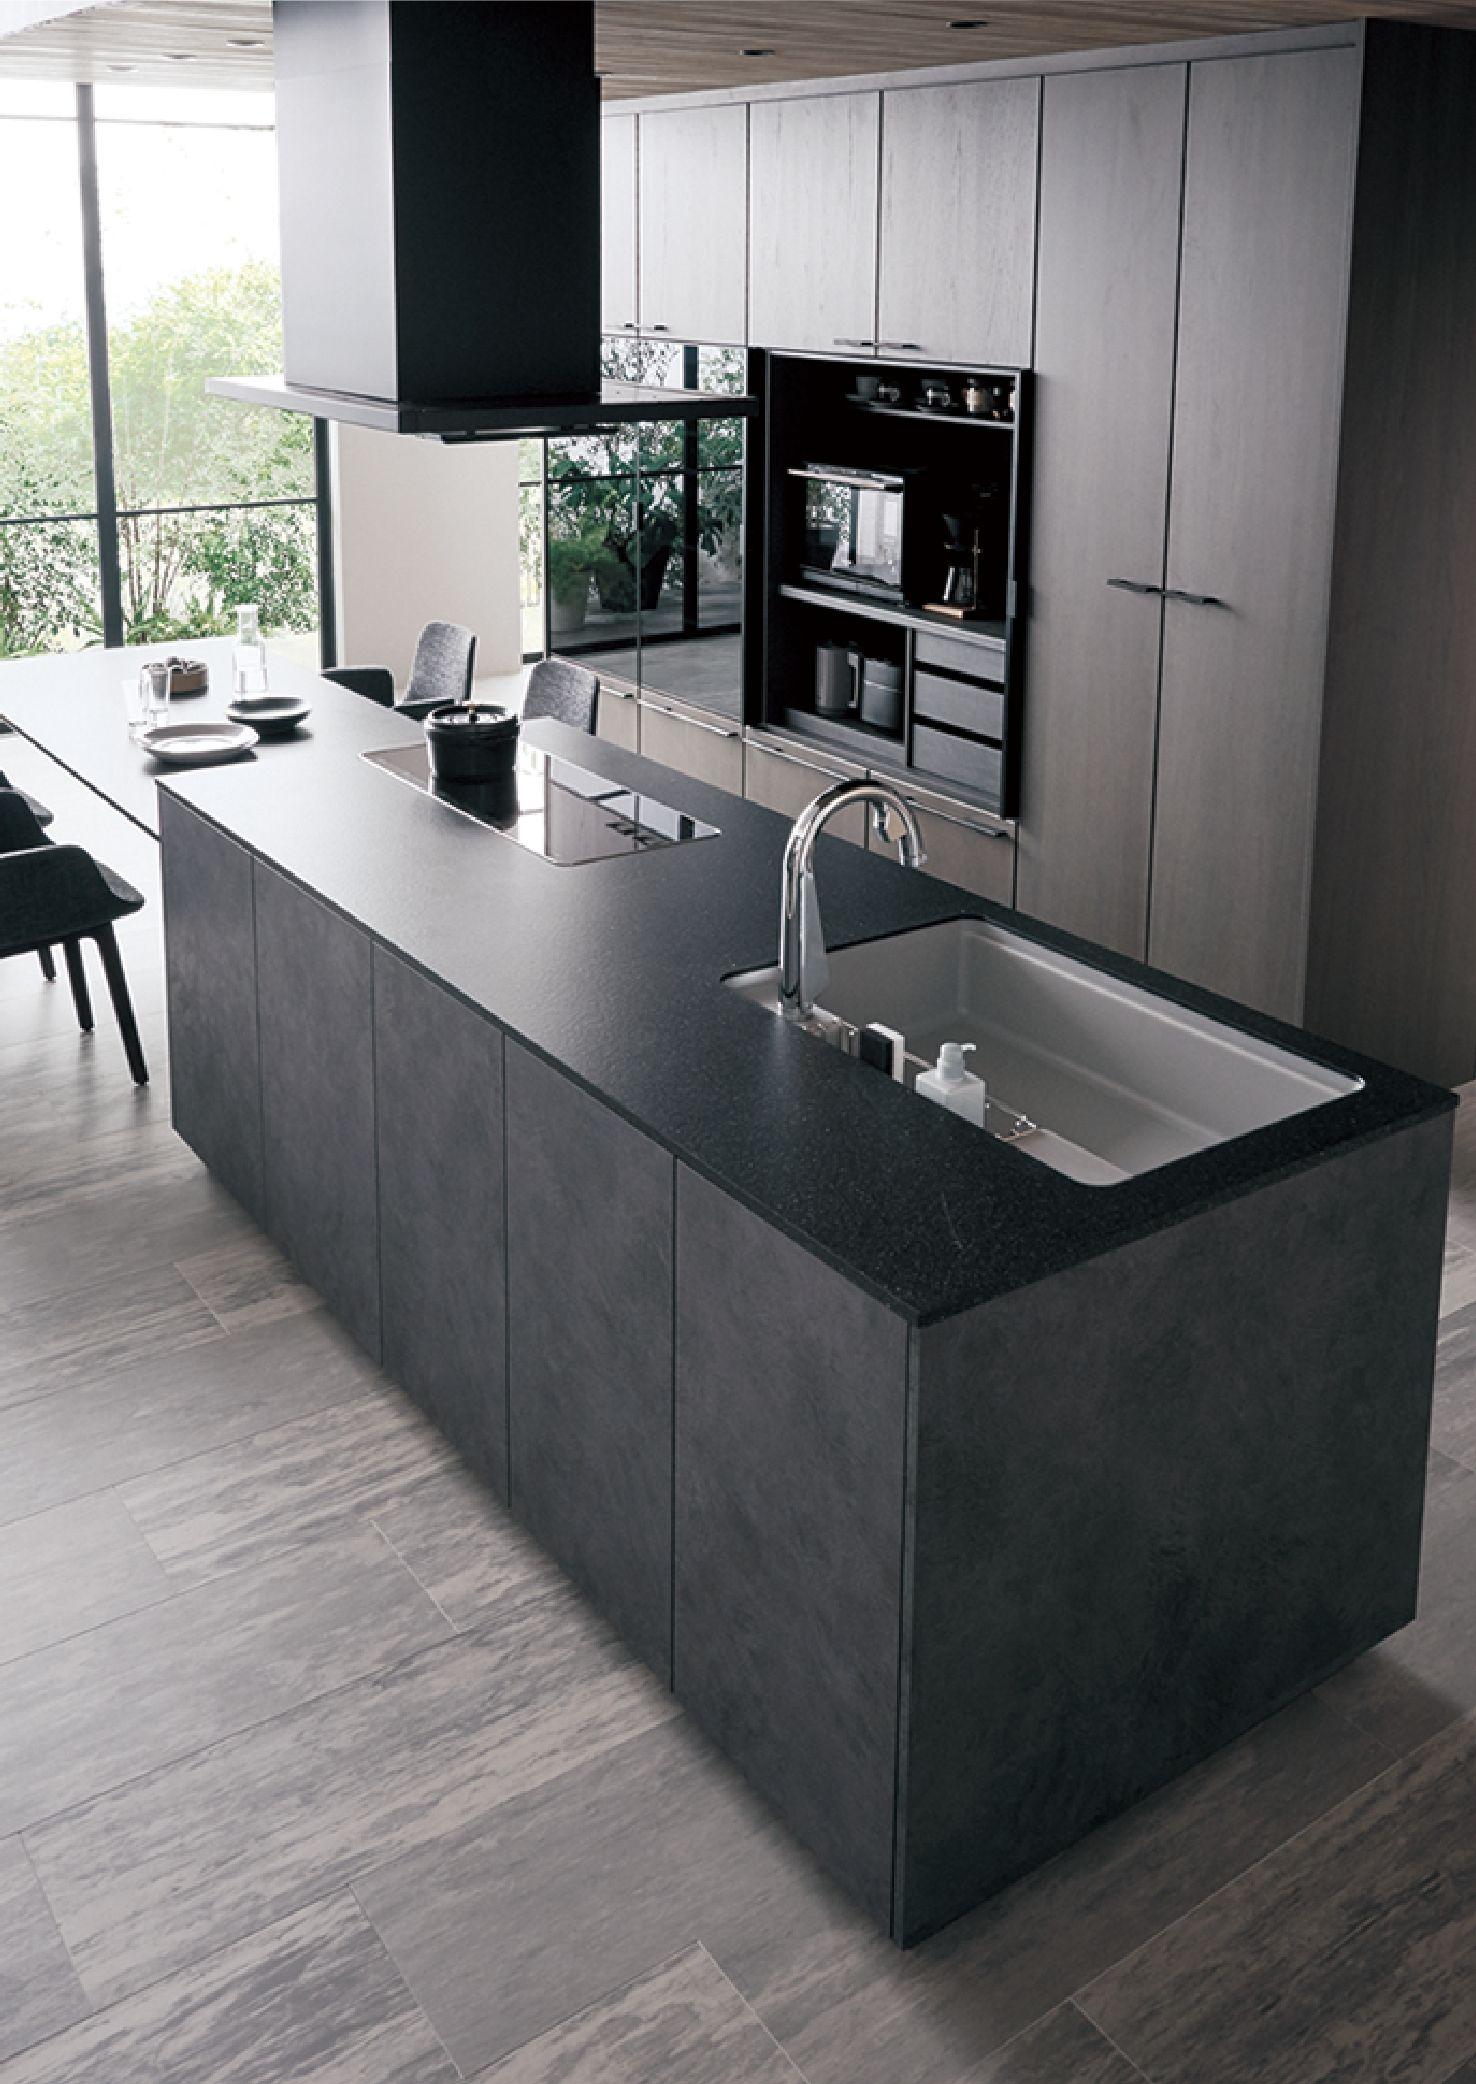 Panasonicのlクラスキッチンをご紹介 キッチン間取り 厨房 設計 キッチンデザイン